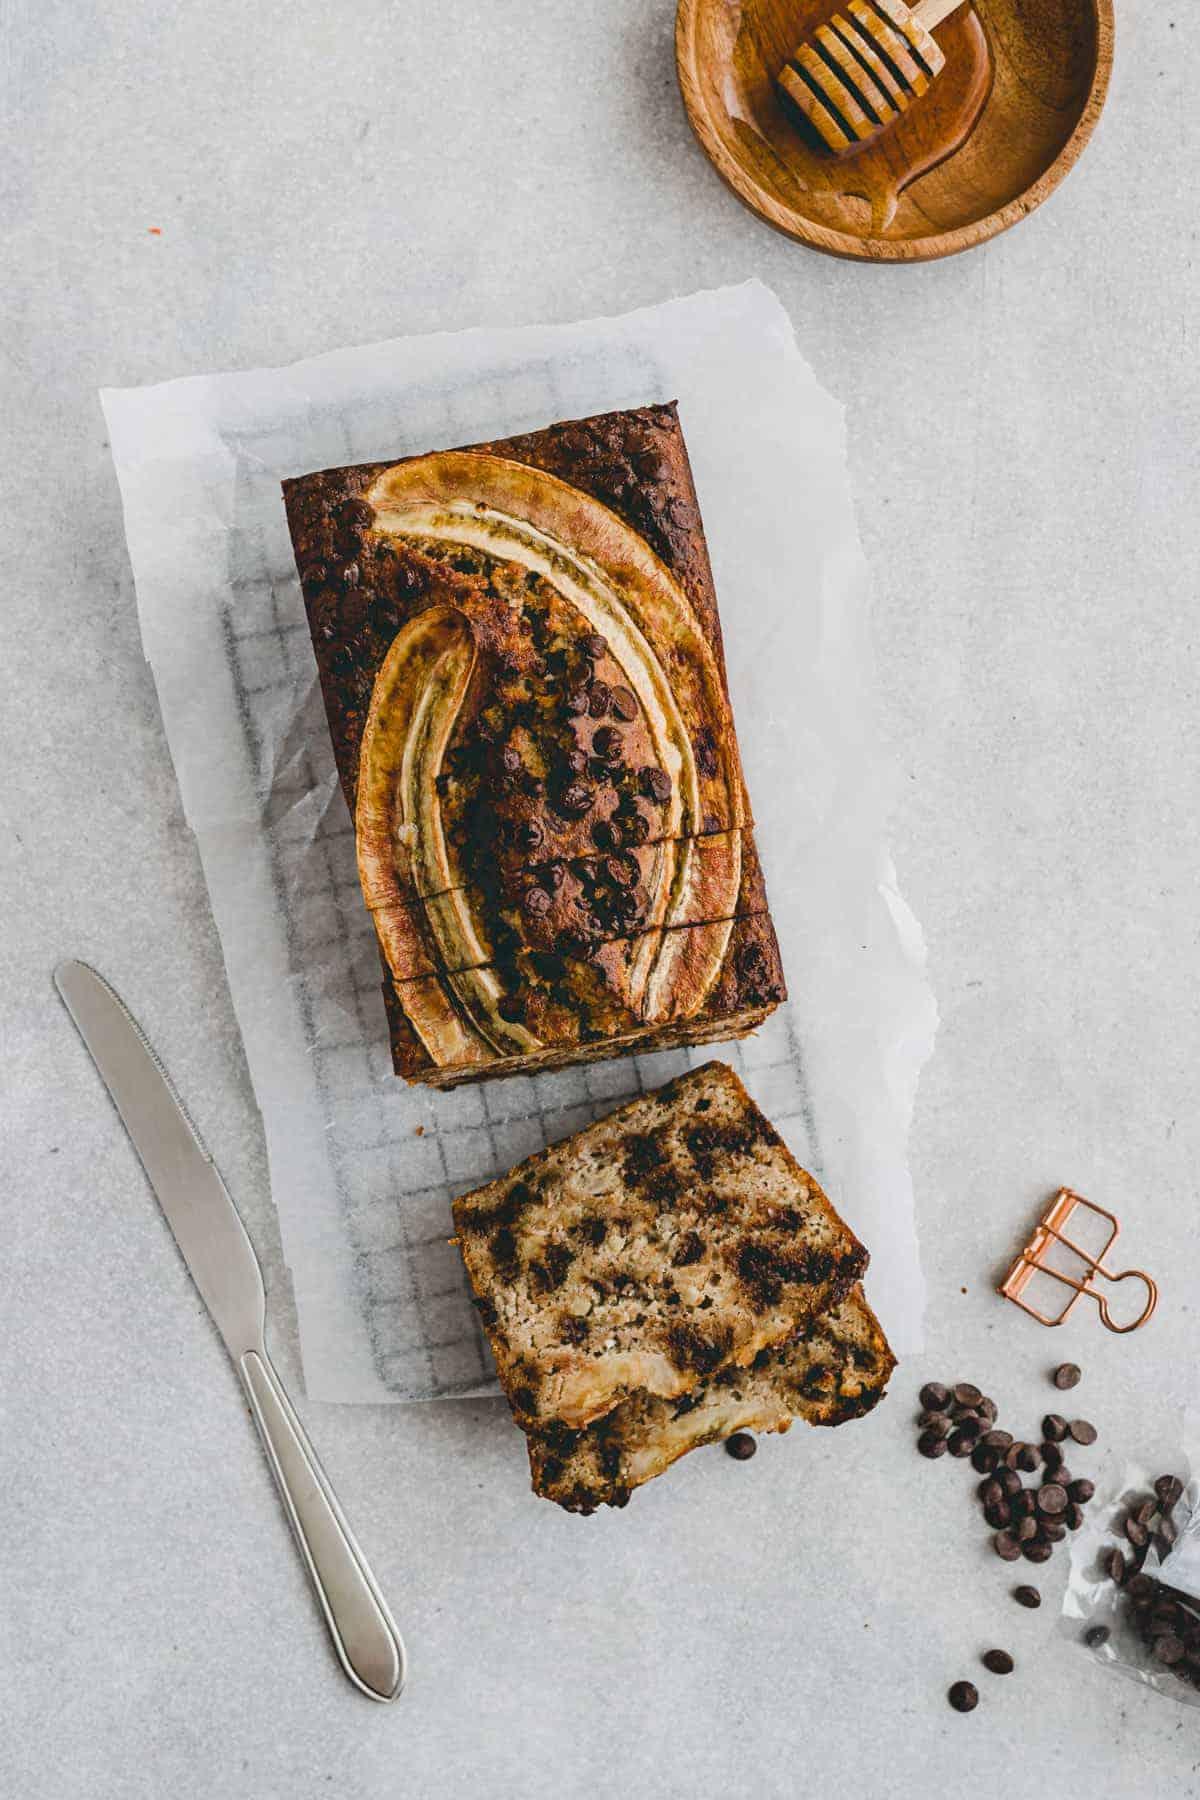 paleo chocolate chip banana bread on a rack